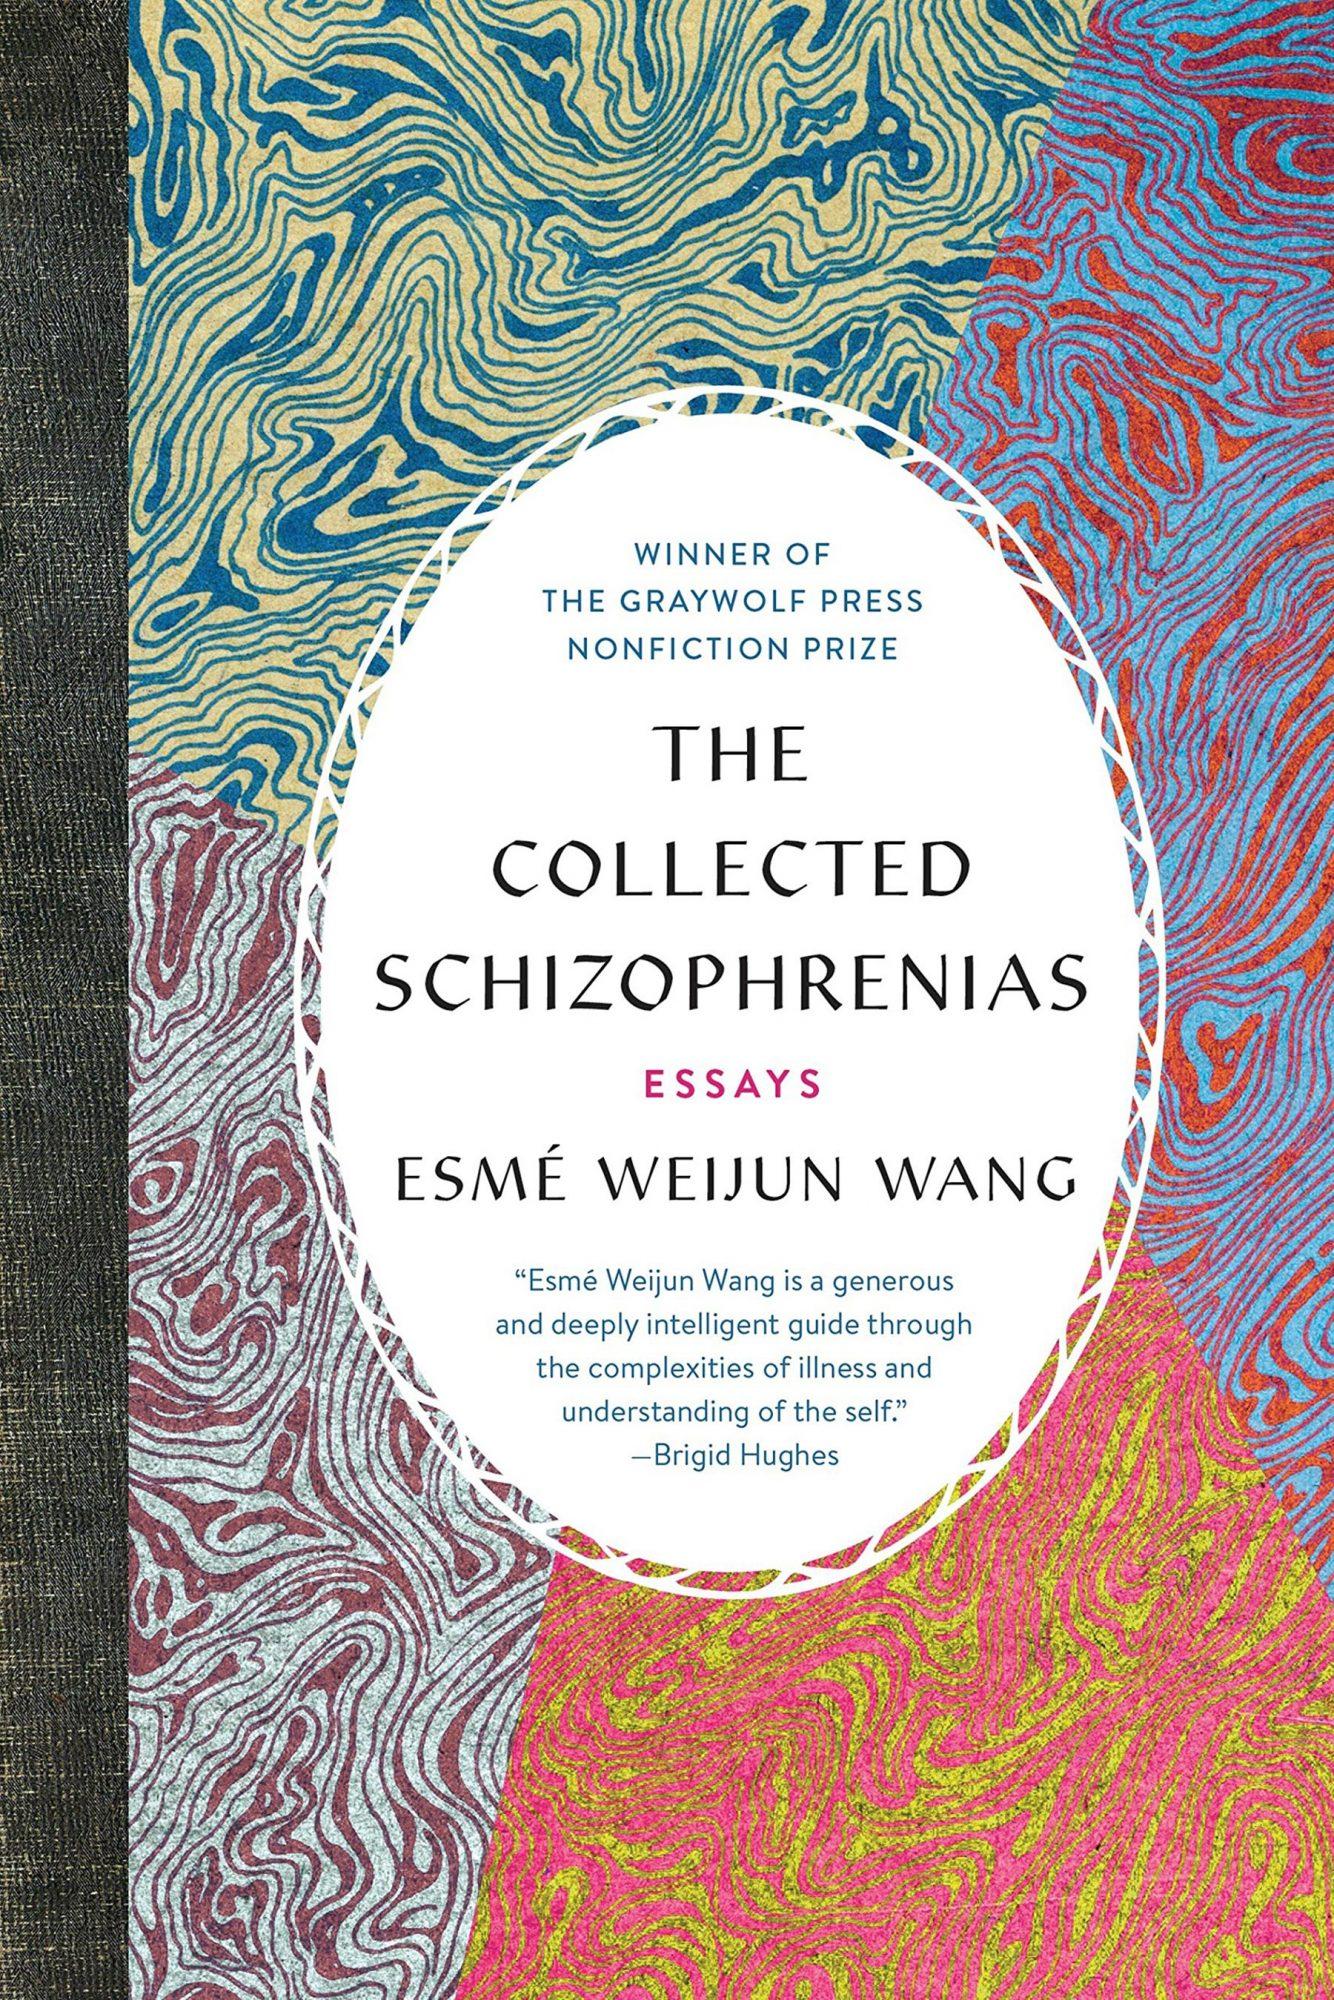 Esme Wang, The Collected SchizophreniasPublisher: Graywolf Press